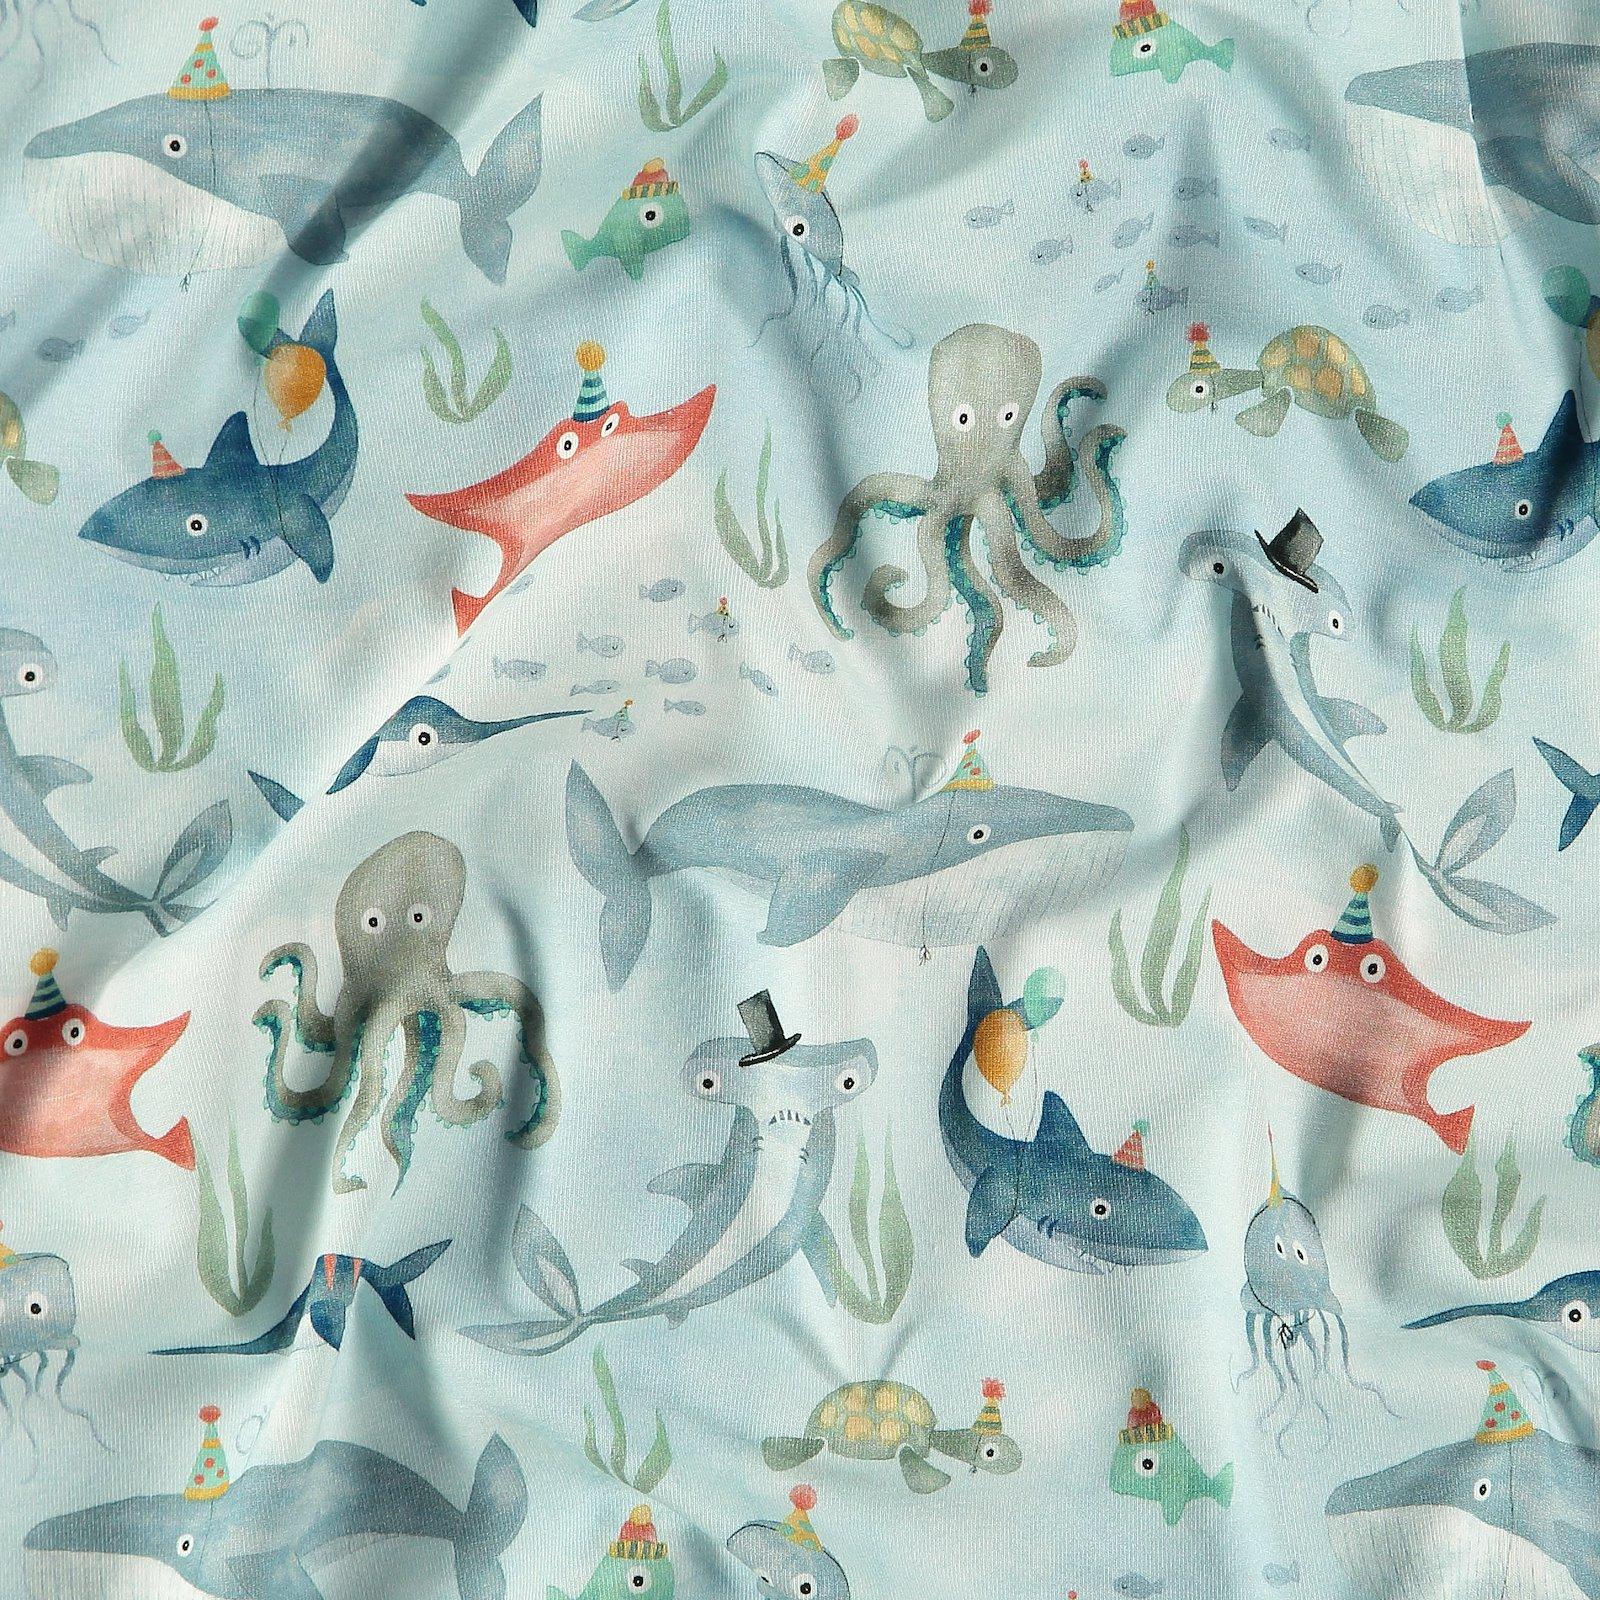 Organic st jersey blue with sea animals